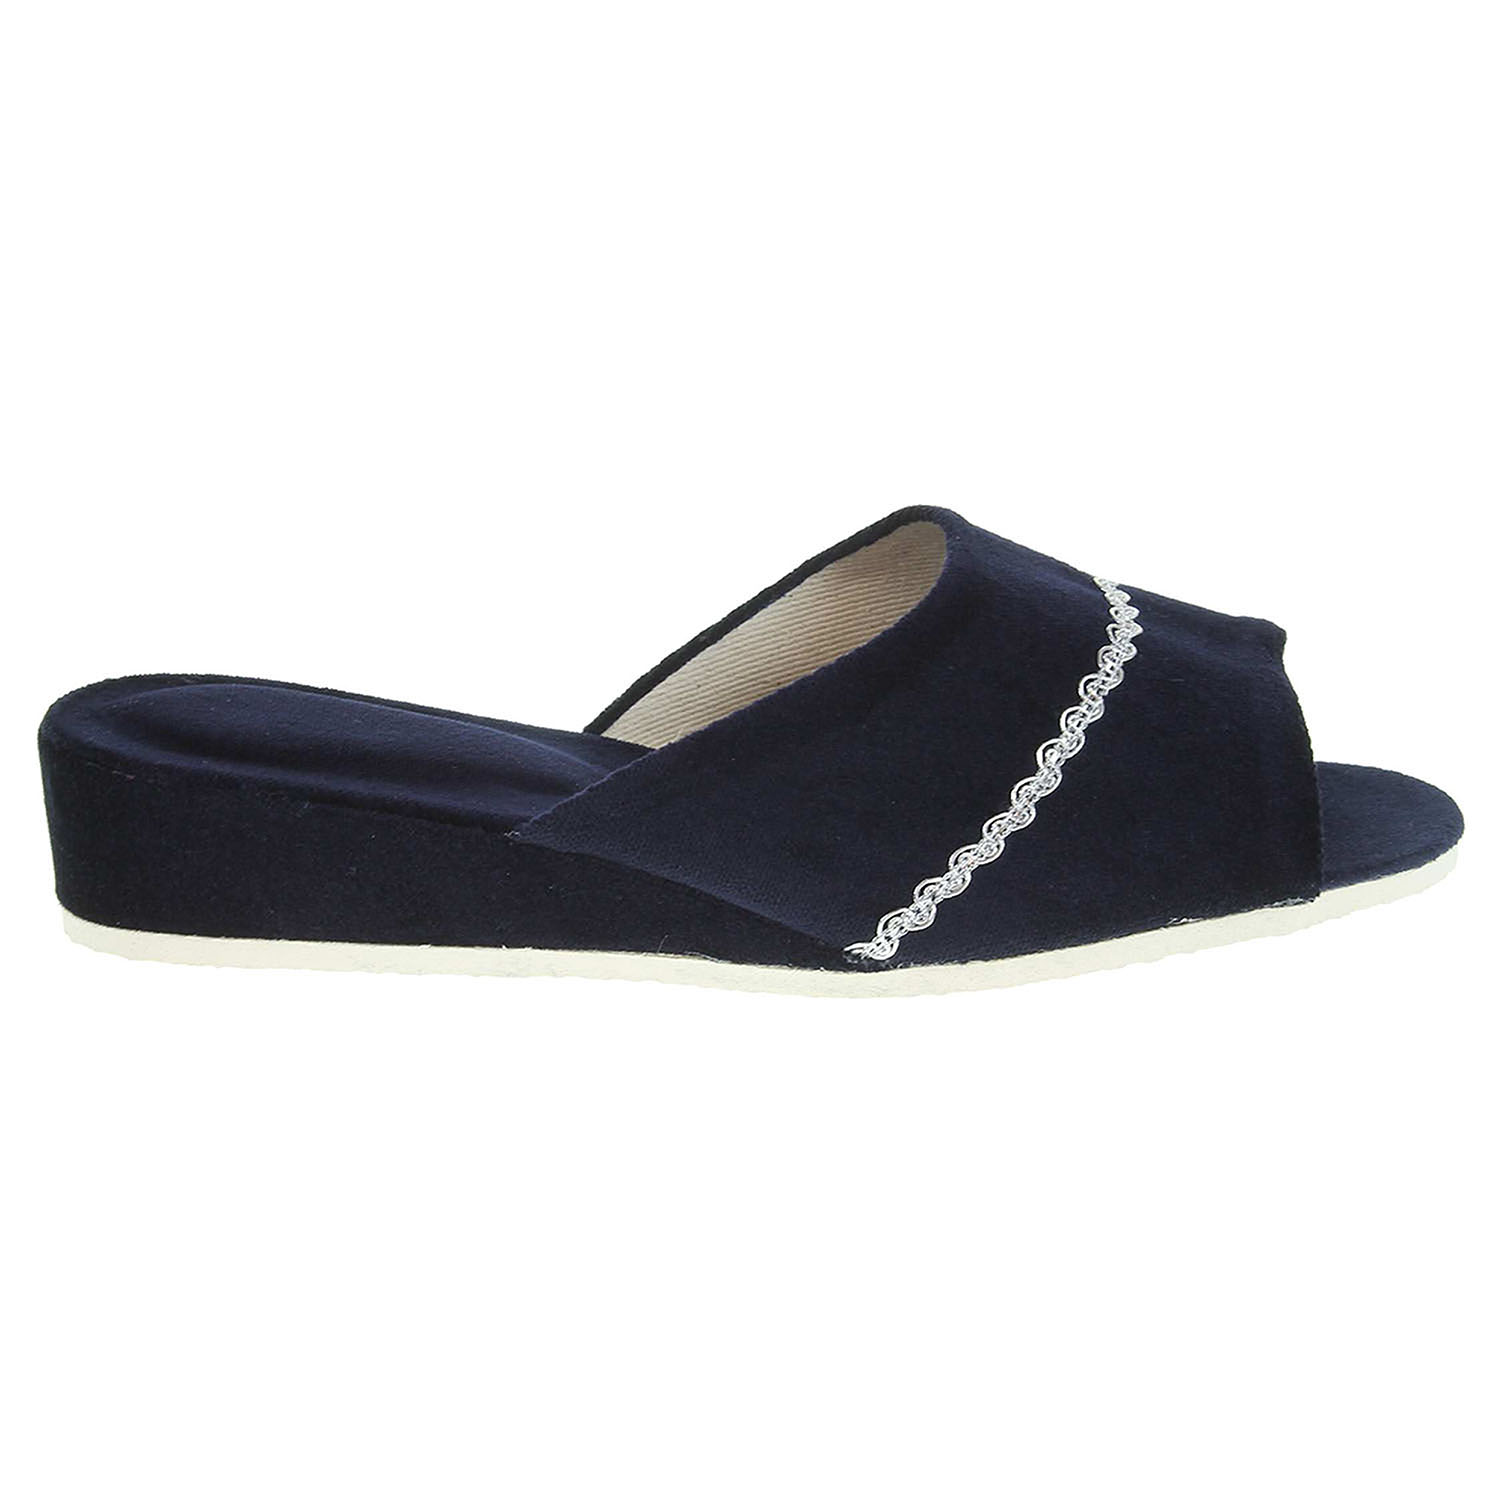 Ecco Dámské domácí pantofle 1029.00 modré 23500488